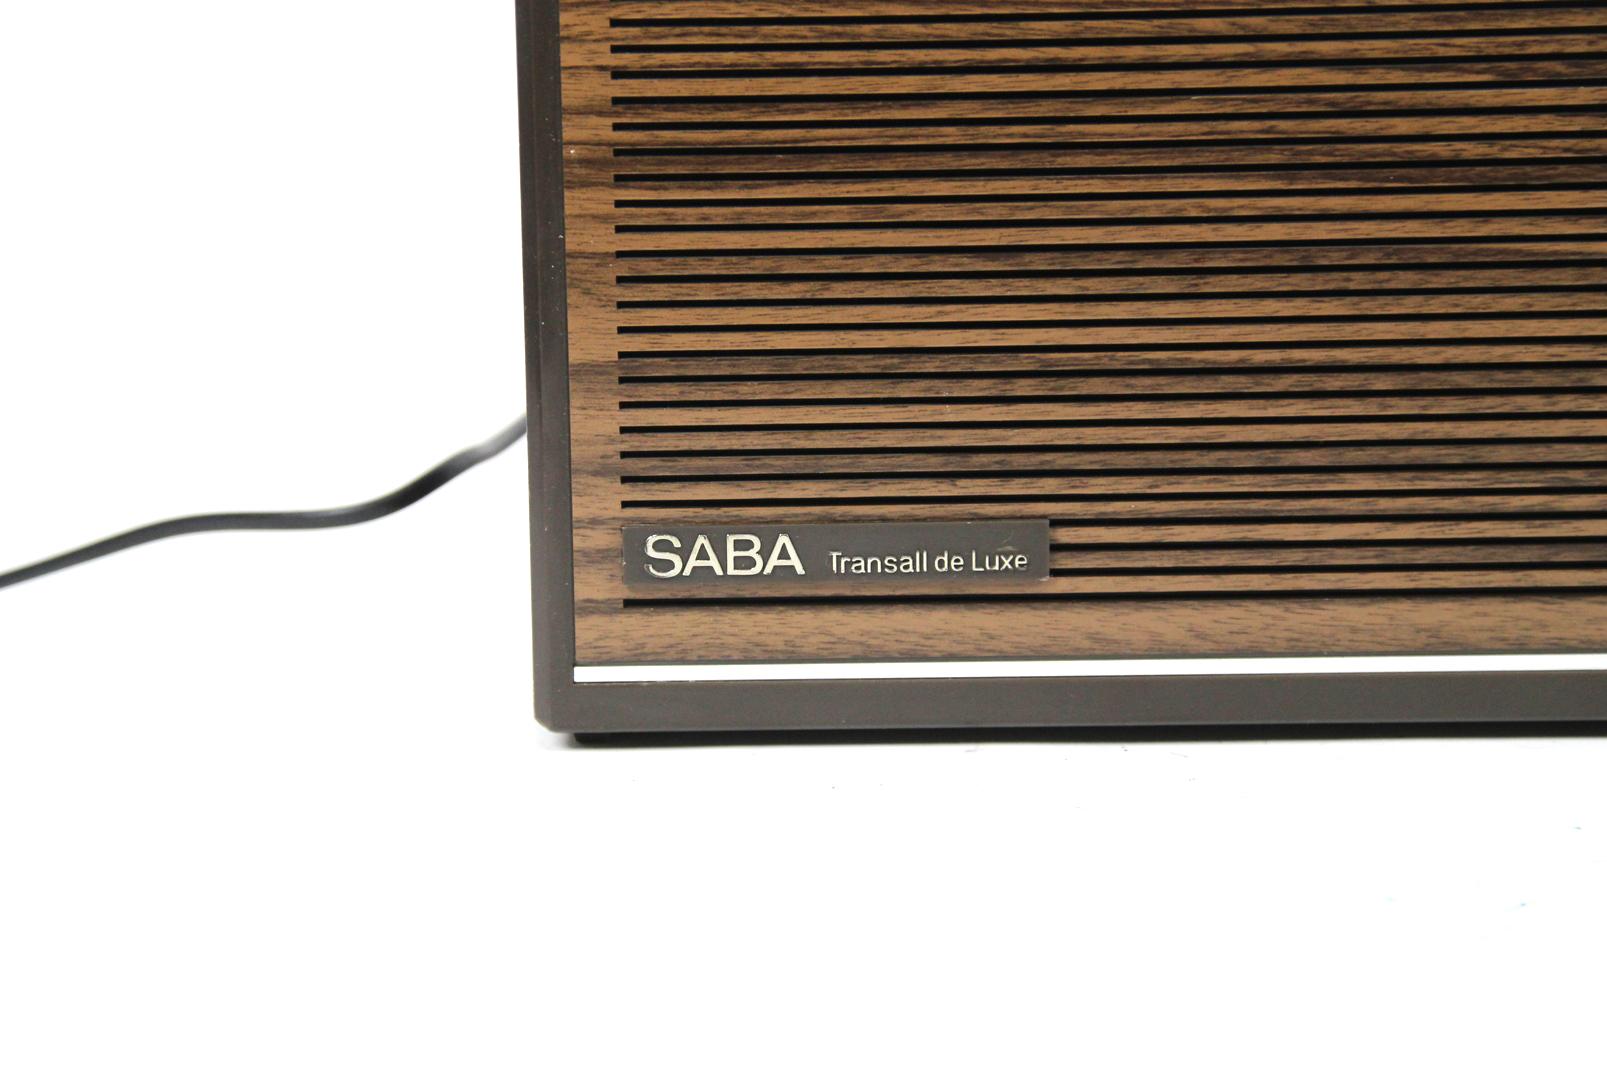 saba transall de luxe automatic g transistorradio kofferradio nostalgie radio ebay. Black Bedroom Furniture Sets. Home Design Ideas